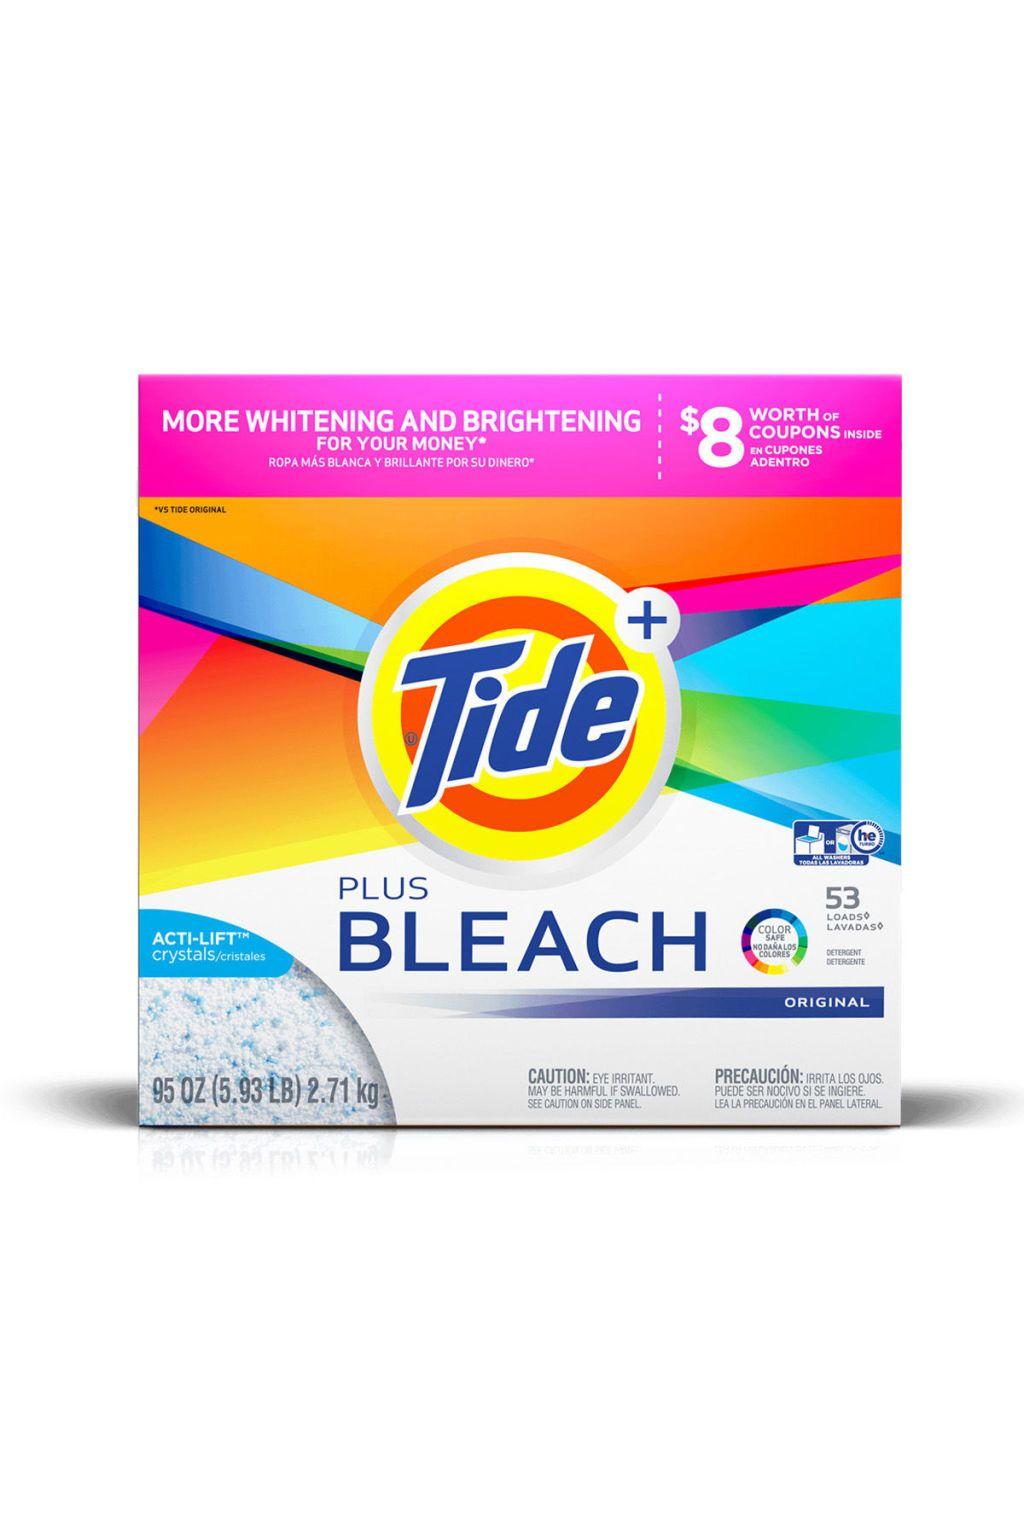 Hero Liquid Laundry Detergent Laundry Detergent Best Laundry Detergent Powder Laundry Soap